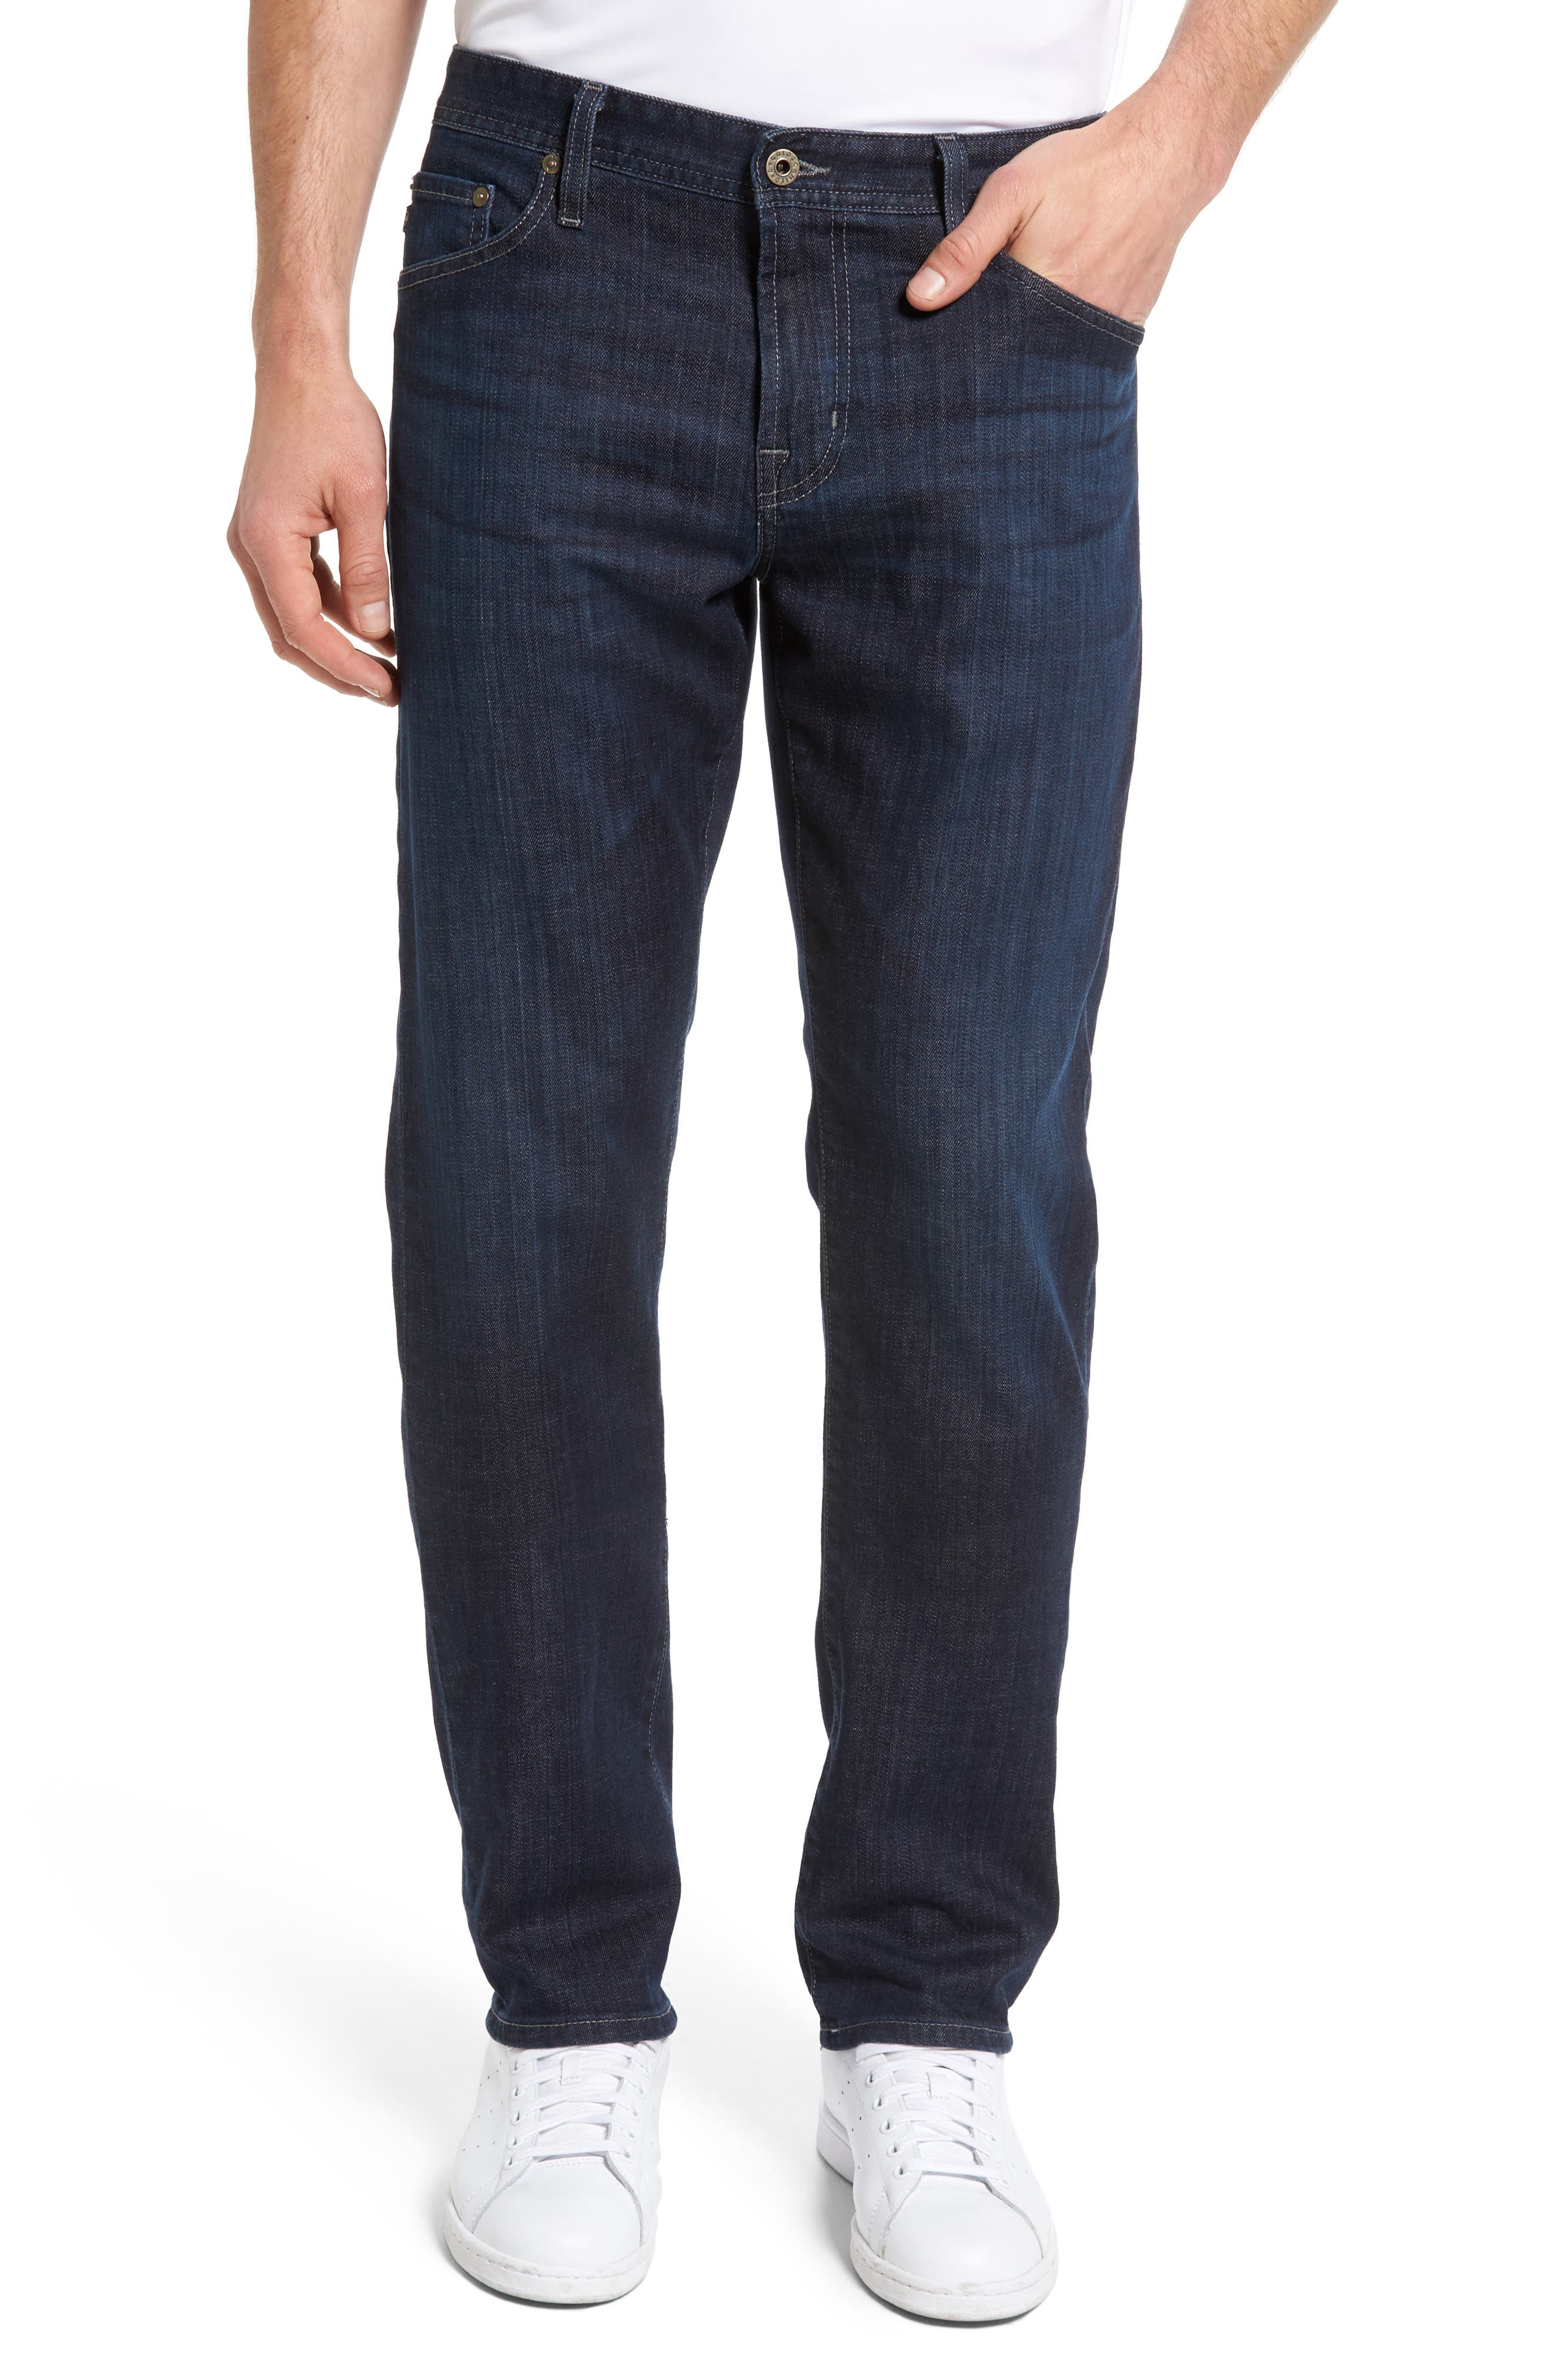 Graduate Slim Straight Leg Jeans,                             Main thumbnail 1, color,                             472